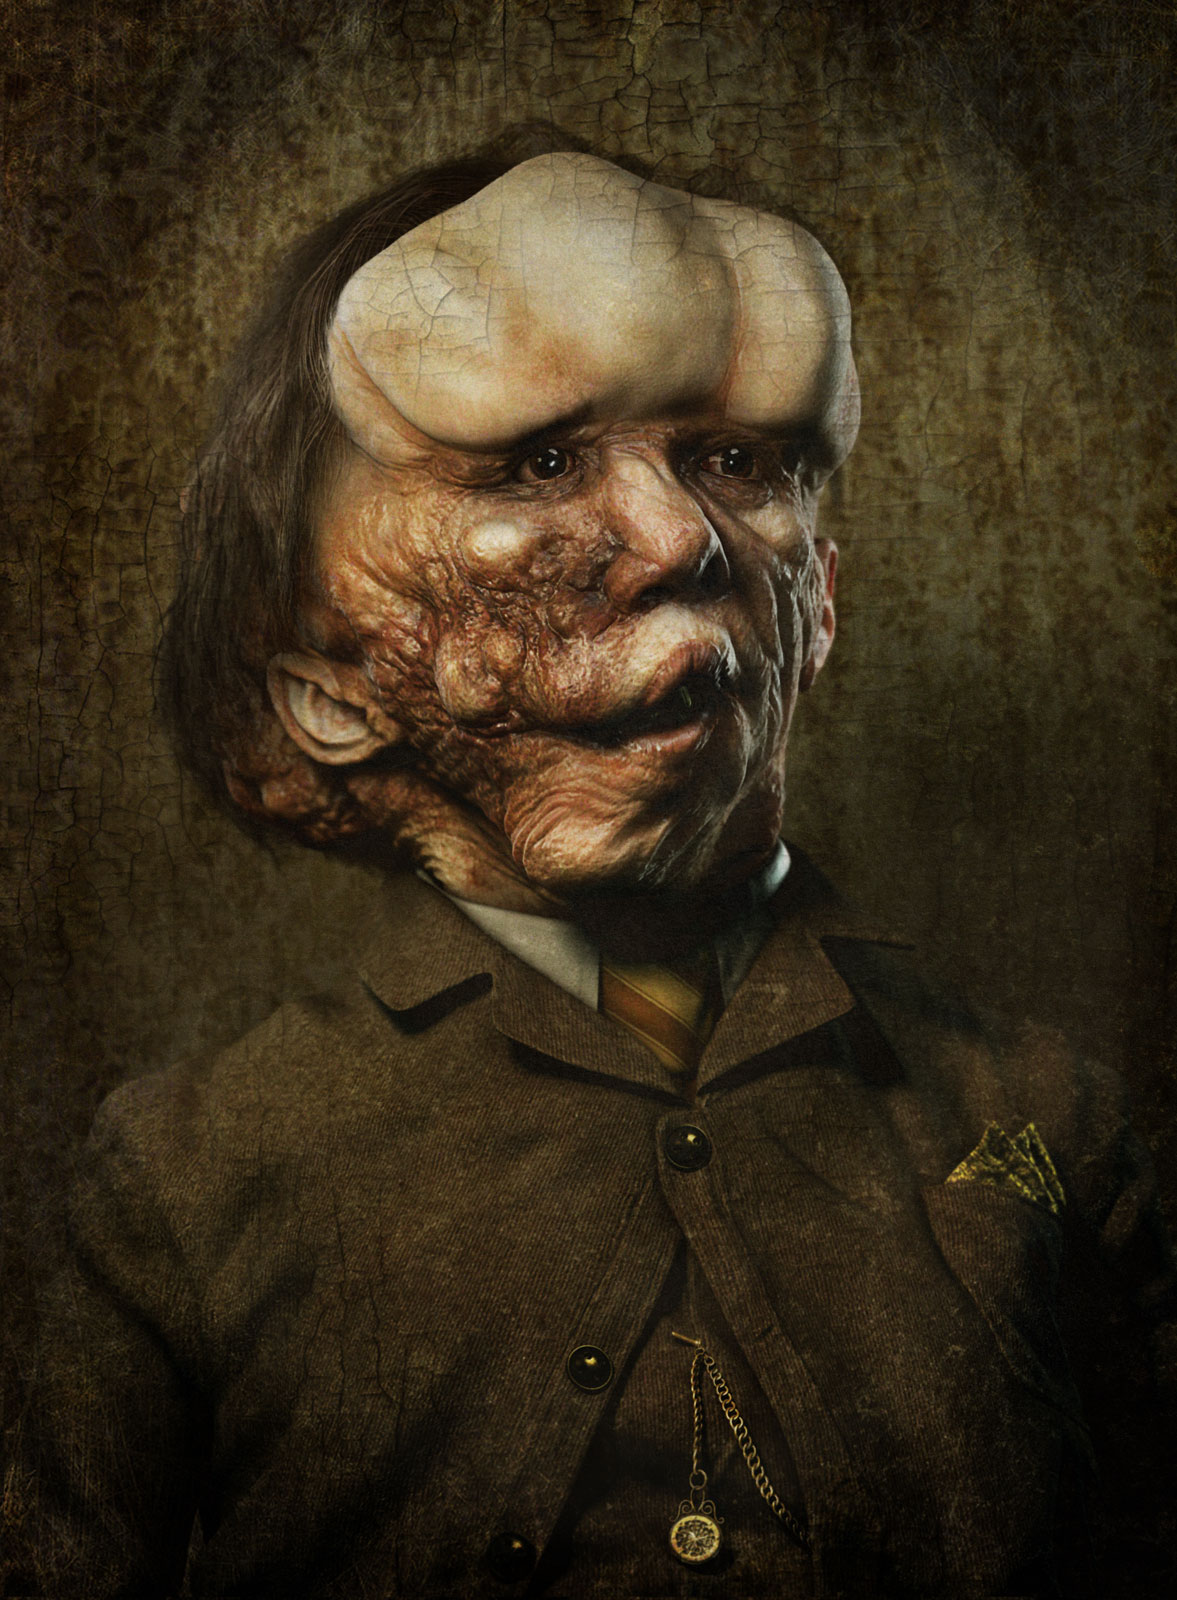 joseph-merrick-portrait